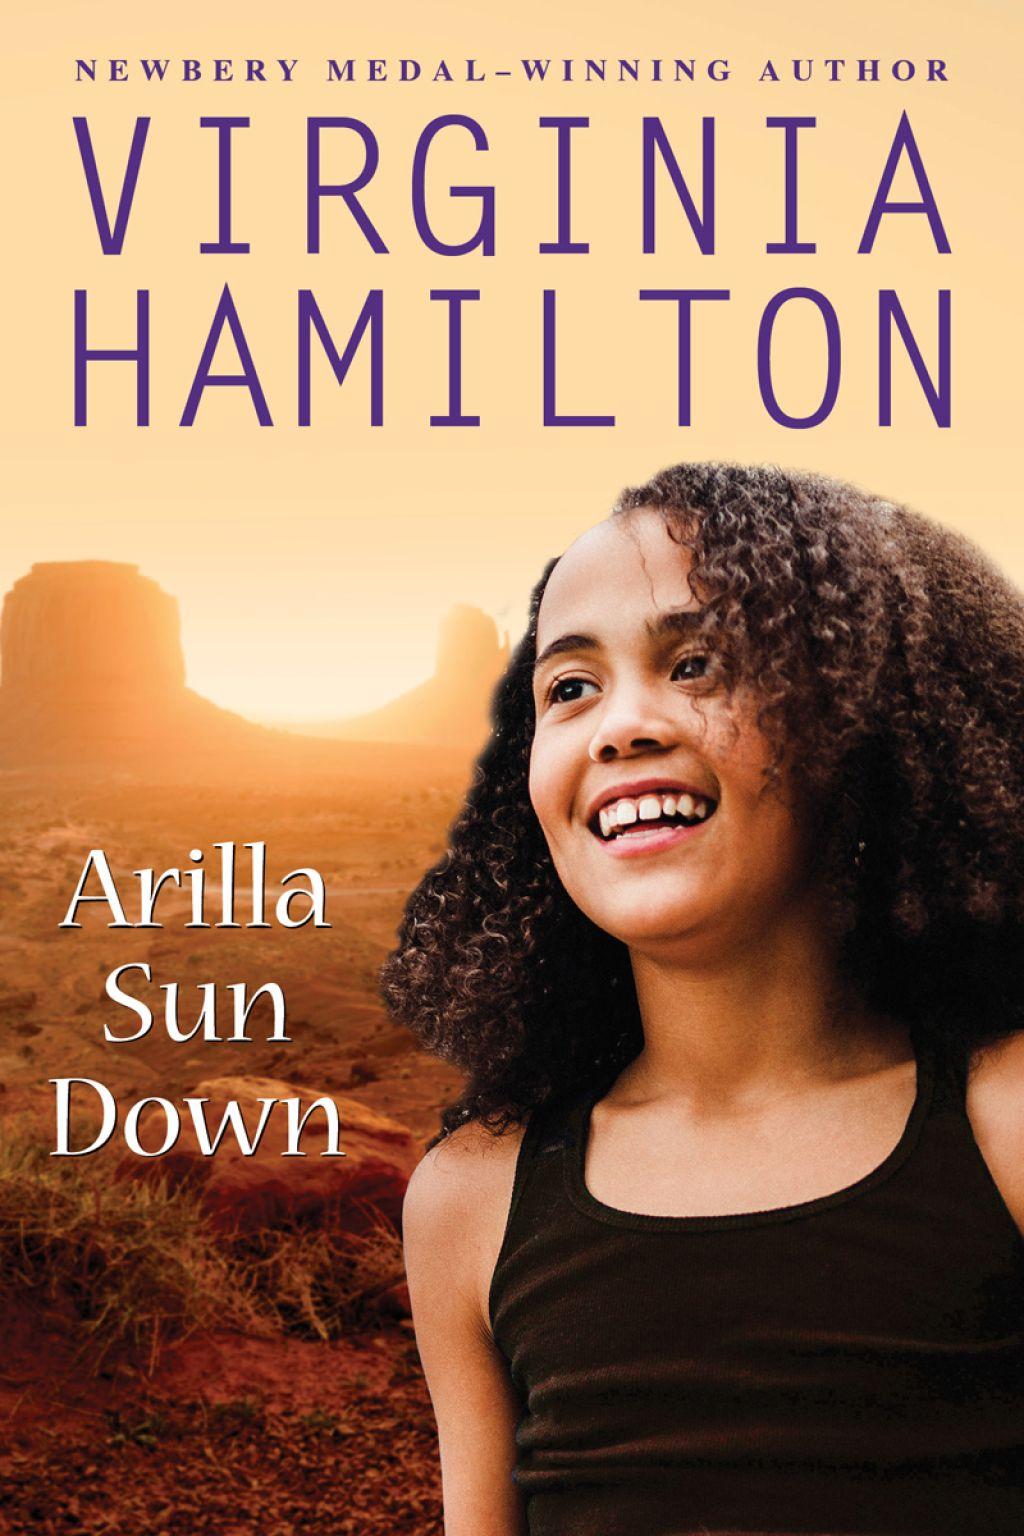 Arilla Sun Down (eBook) American library association